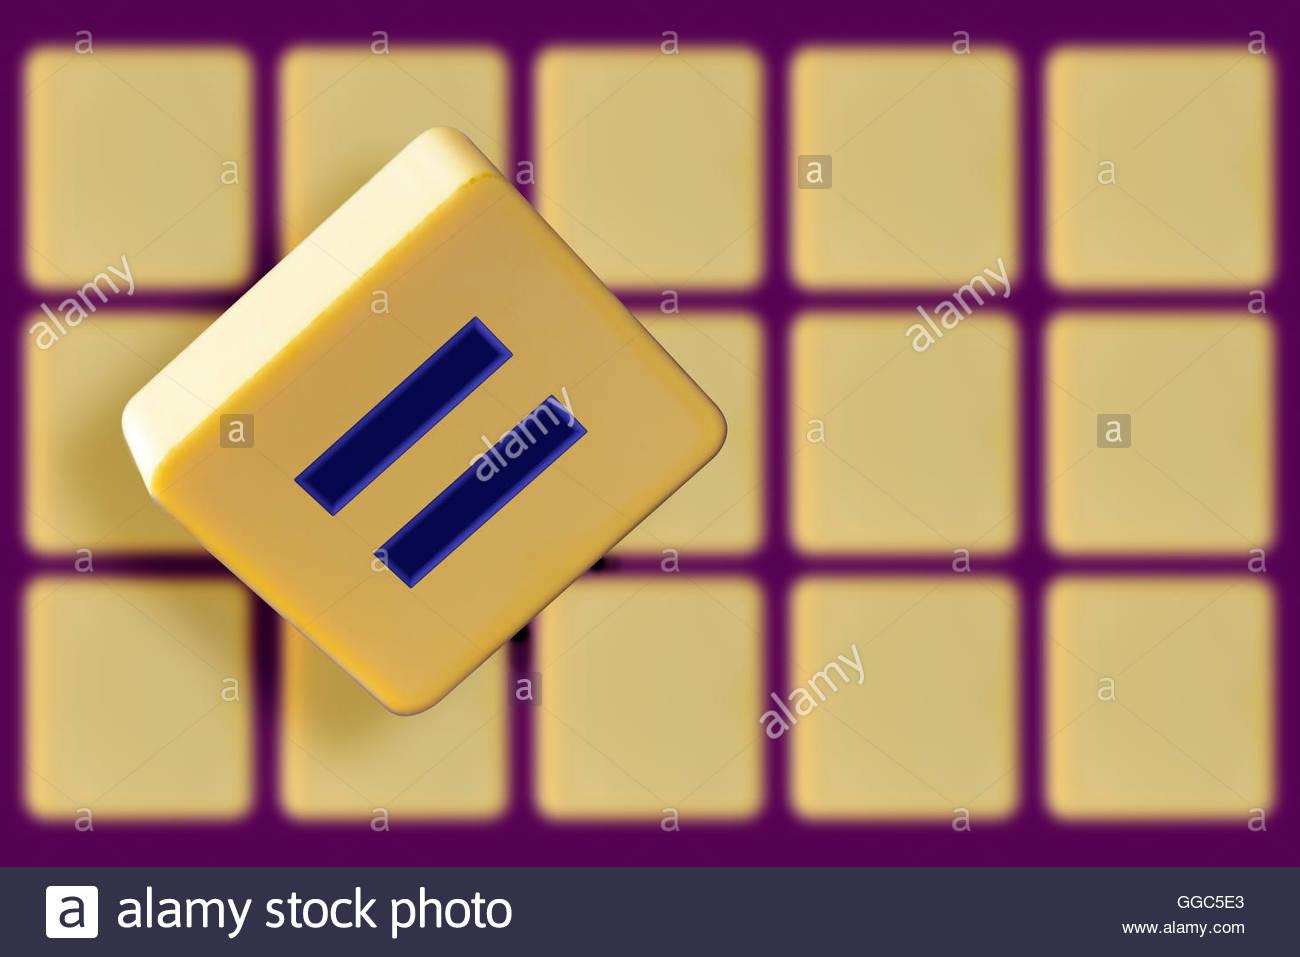 Equals sign on an alphabet tile dorset england britain uk stock